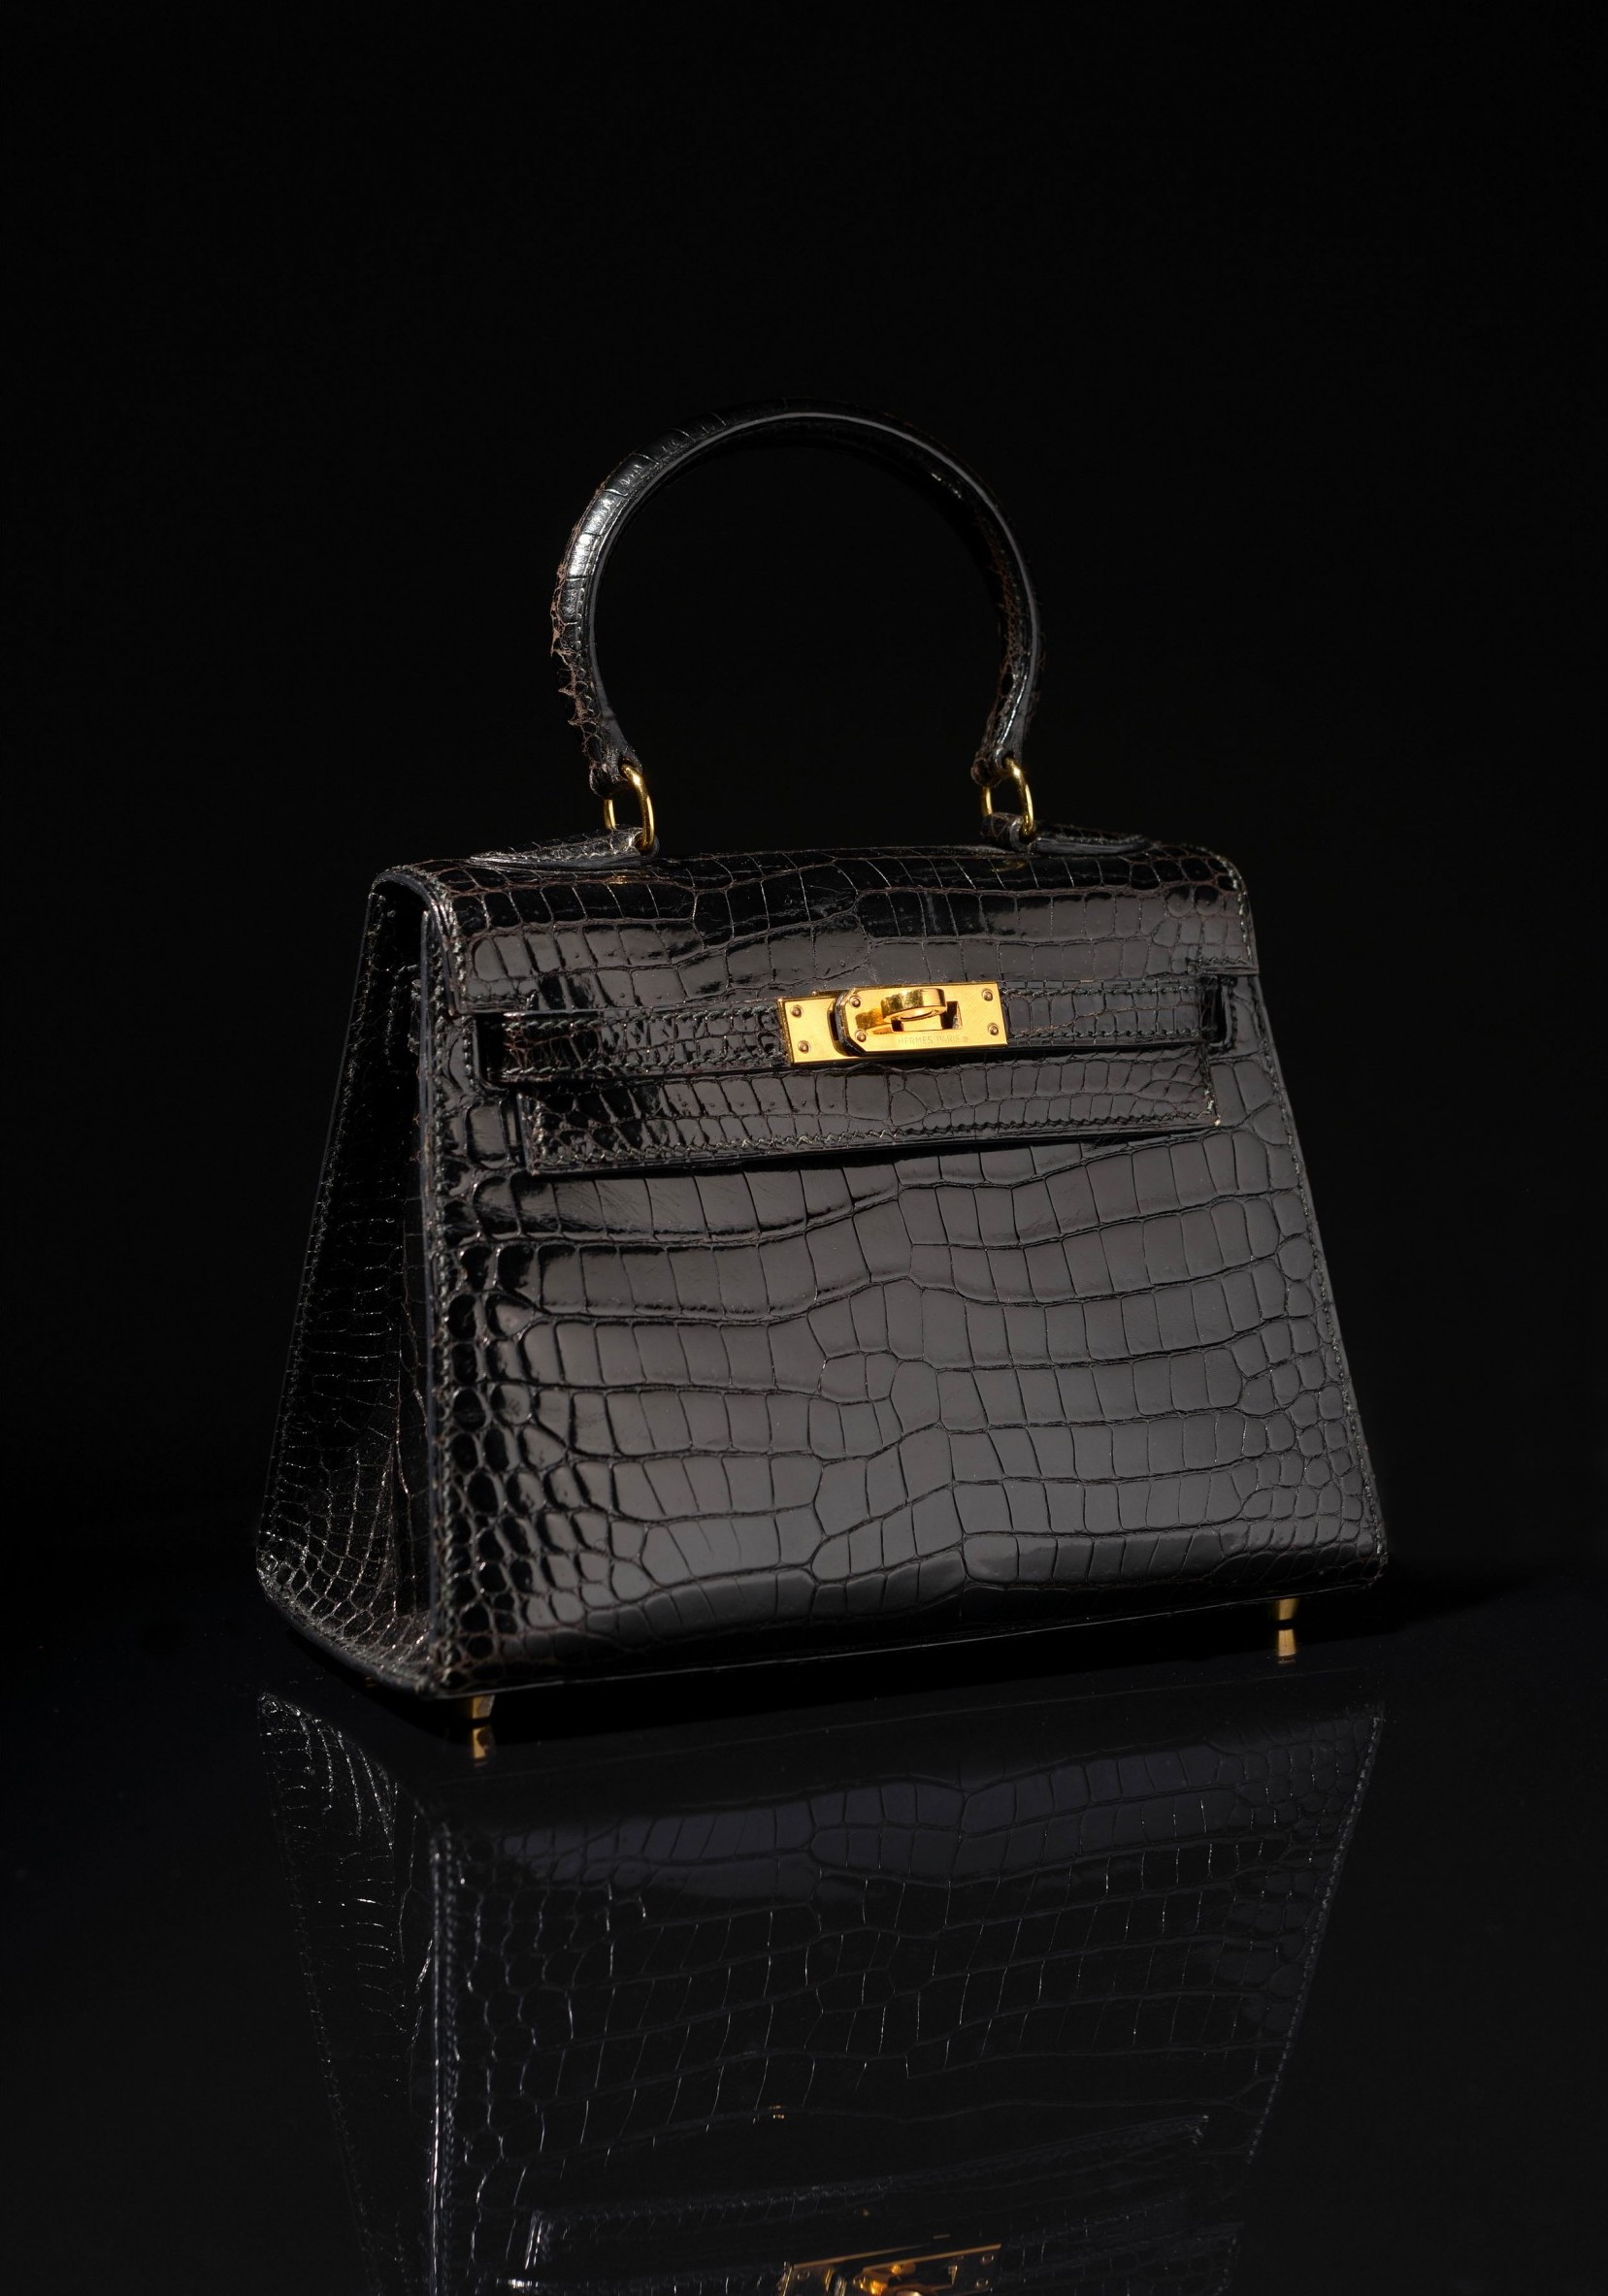 Mini sac « Kelly », Hermès, 1984, image ©HVMC